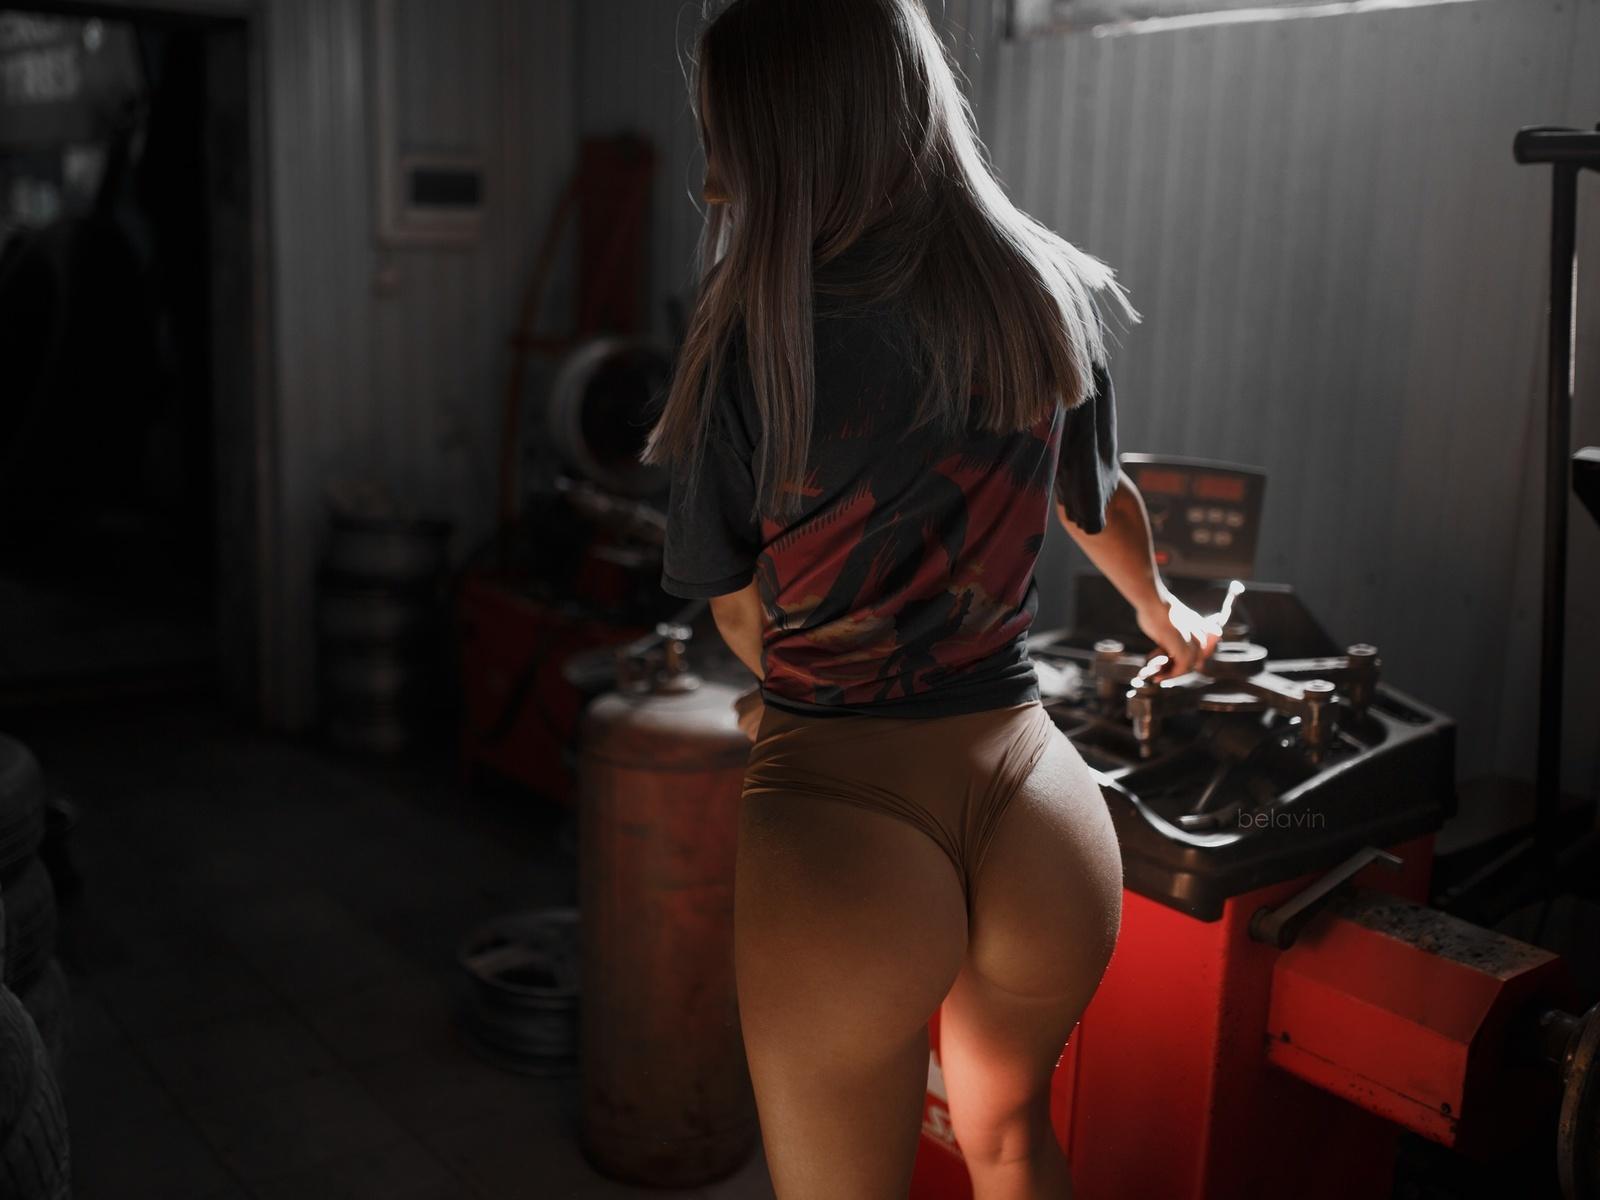 women, alexander belavin, panties, t-shirt, tires, workshop, ass, back, women indoors, brunette